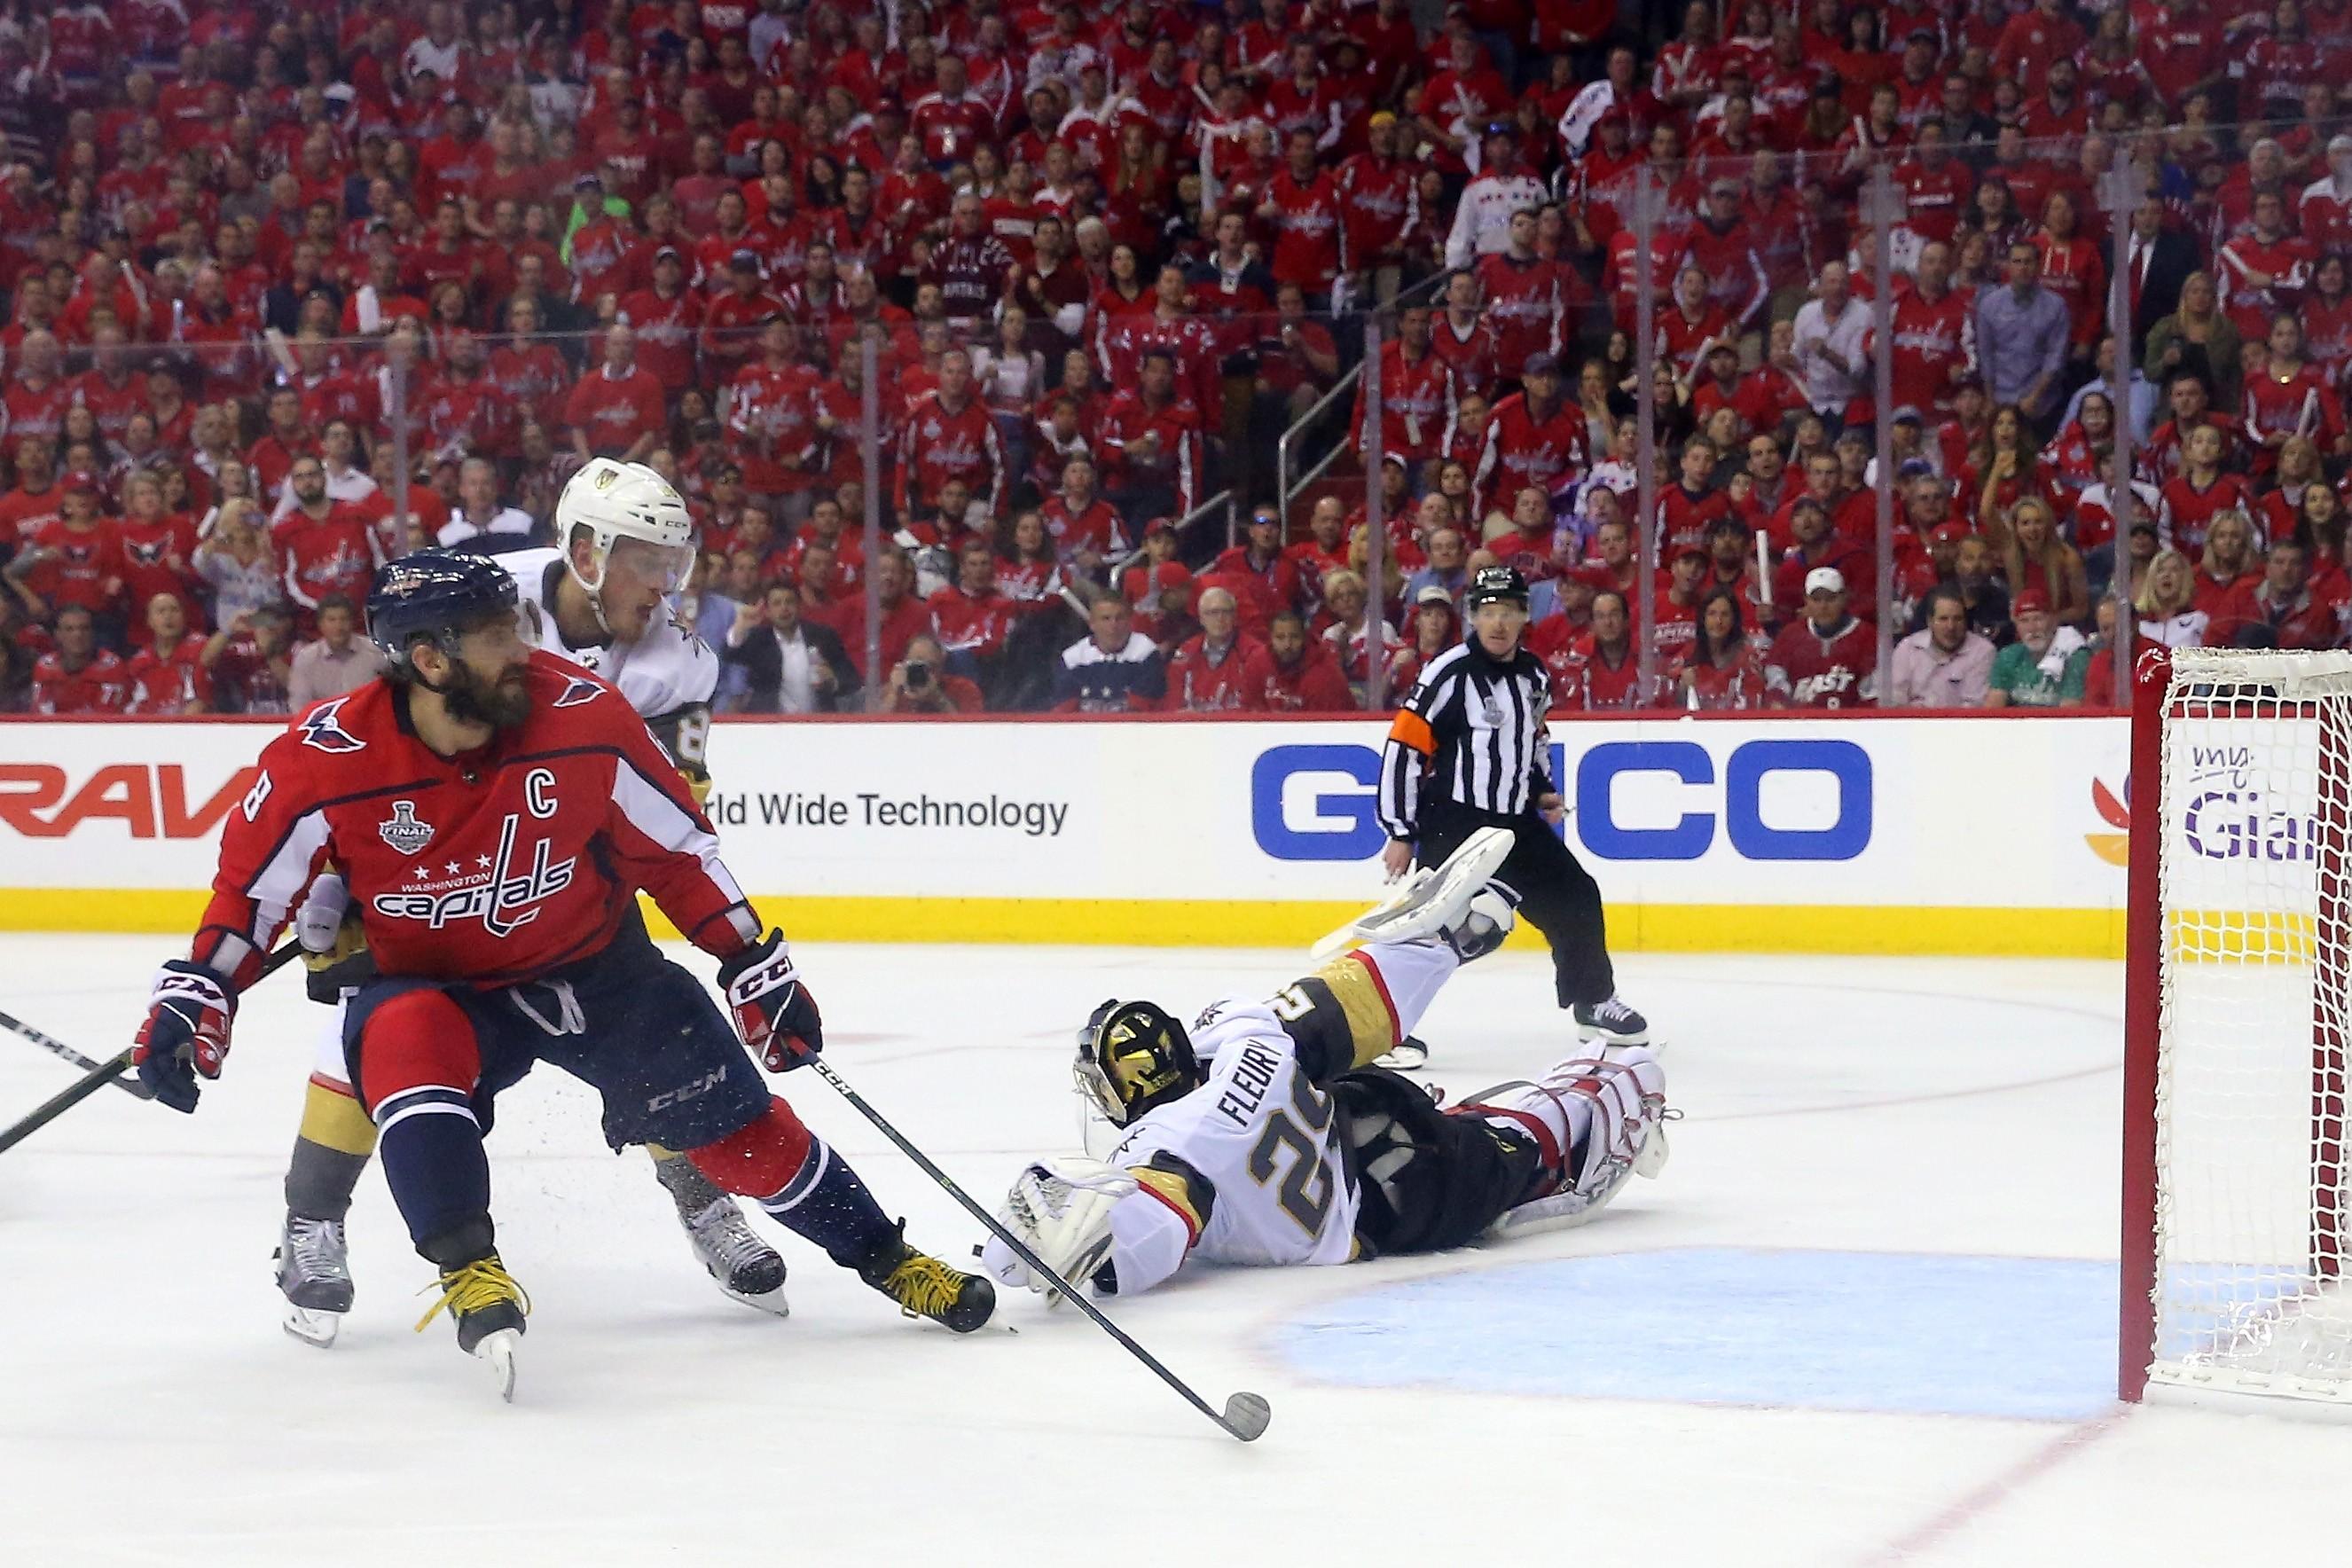 Uma foto da final da NHL 2018, vencida pelos Capitals (Foto: Getty Images)